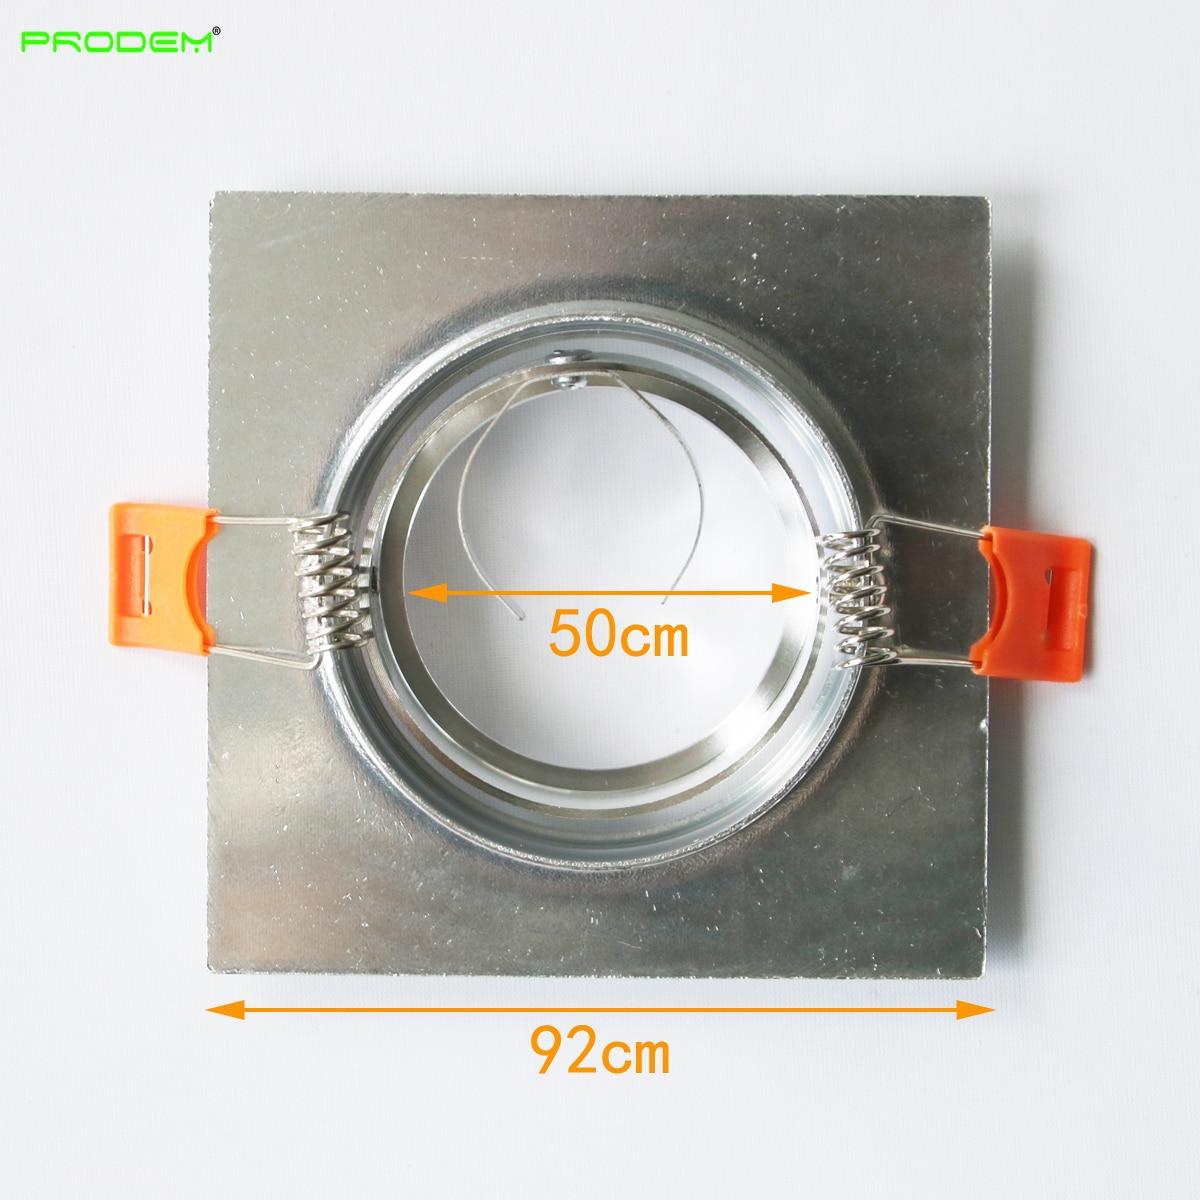 DHL 100*MR16 brim spot light edge GU10 frame single led down light fixture aluminum beam angle adjustable accessories enlarge